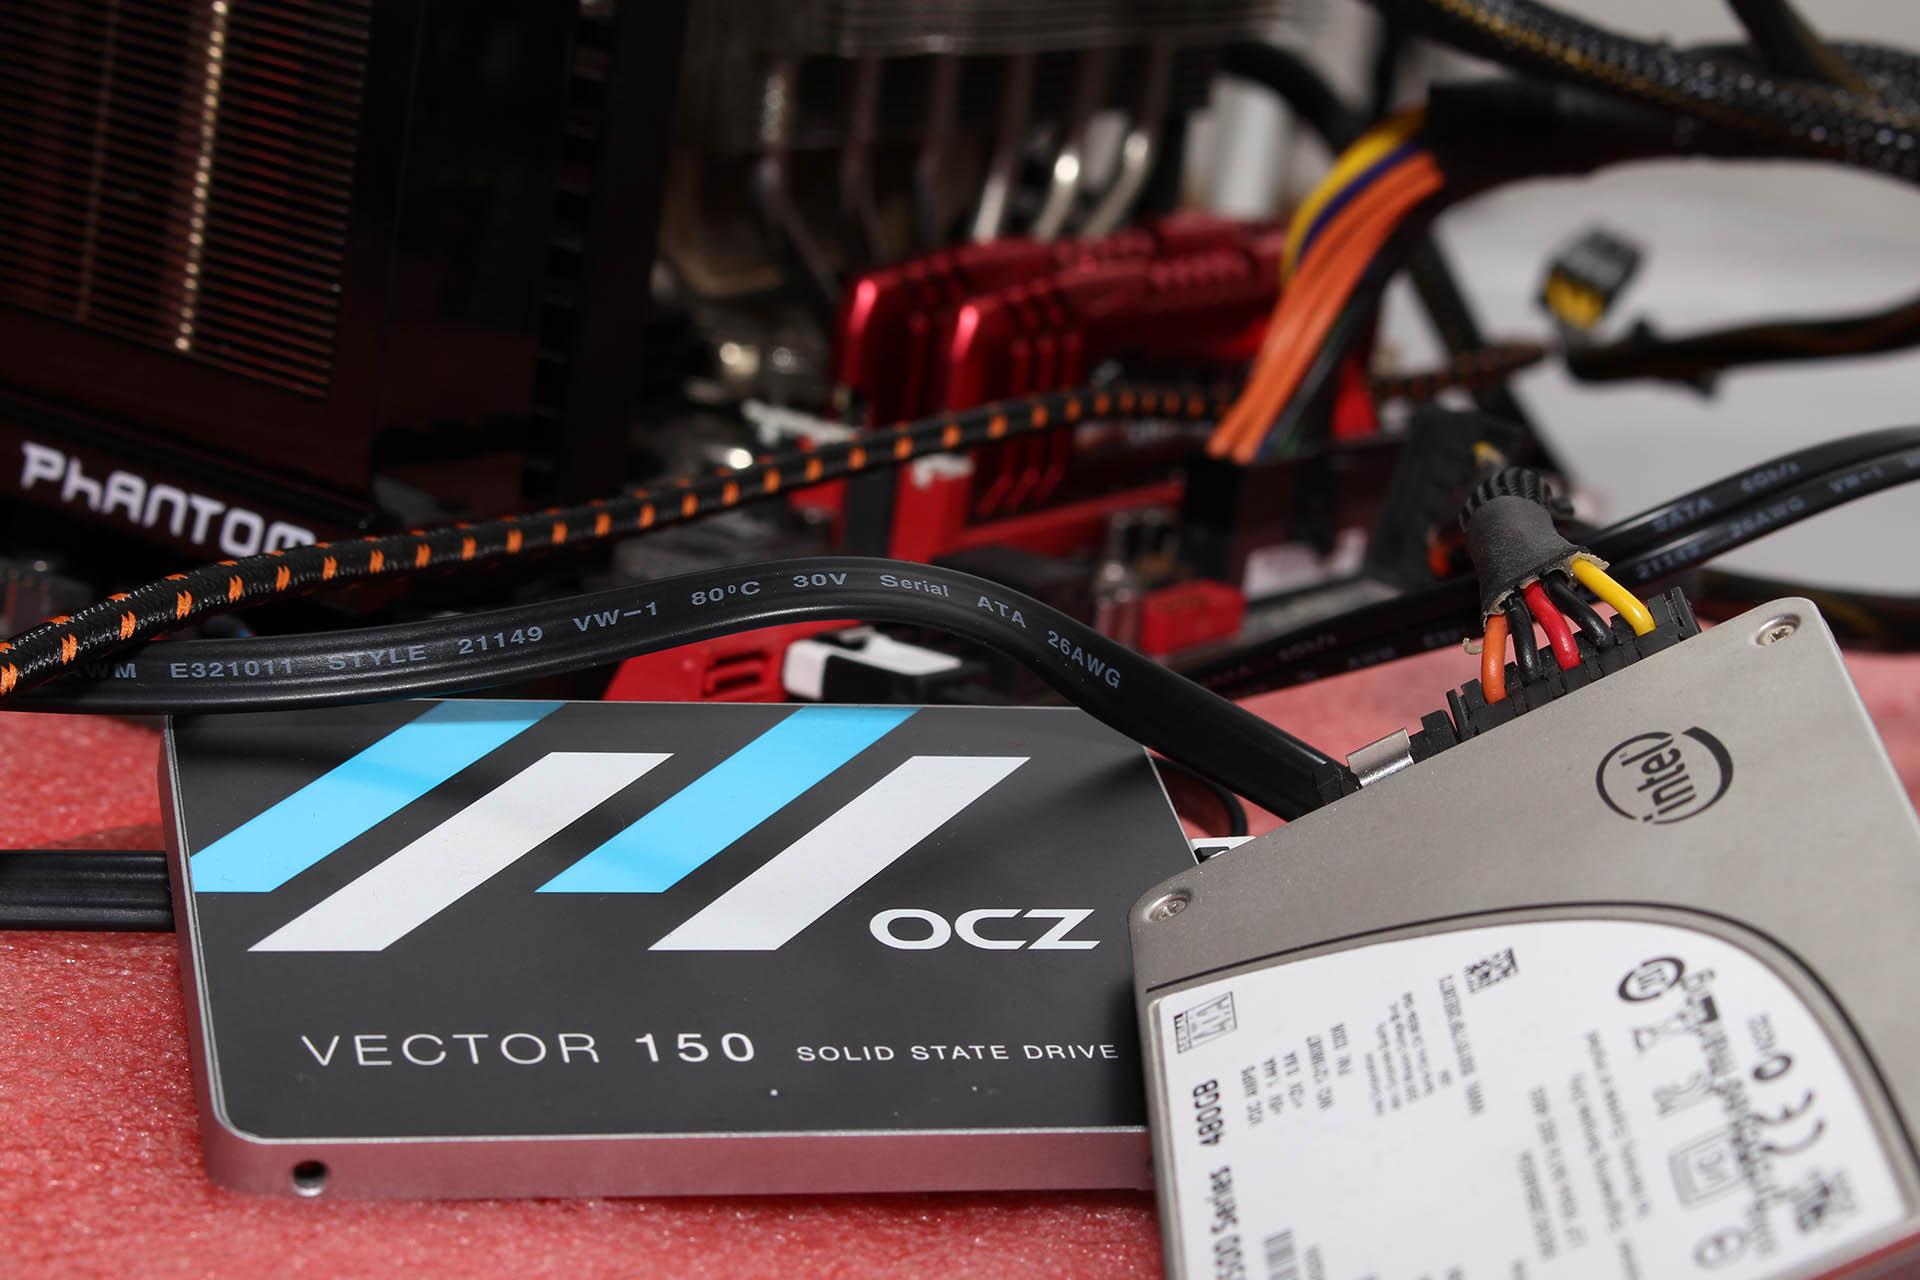 Dnevnik izdržljivosti SSD-a – OCZ Vector 150 240GB @ 220TB